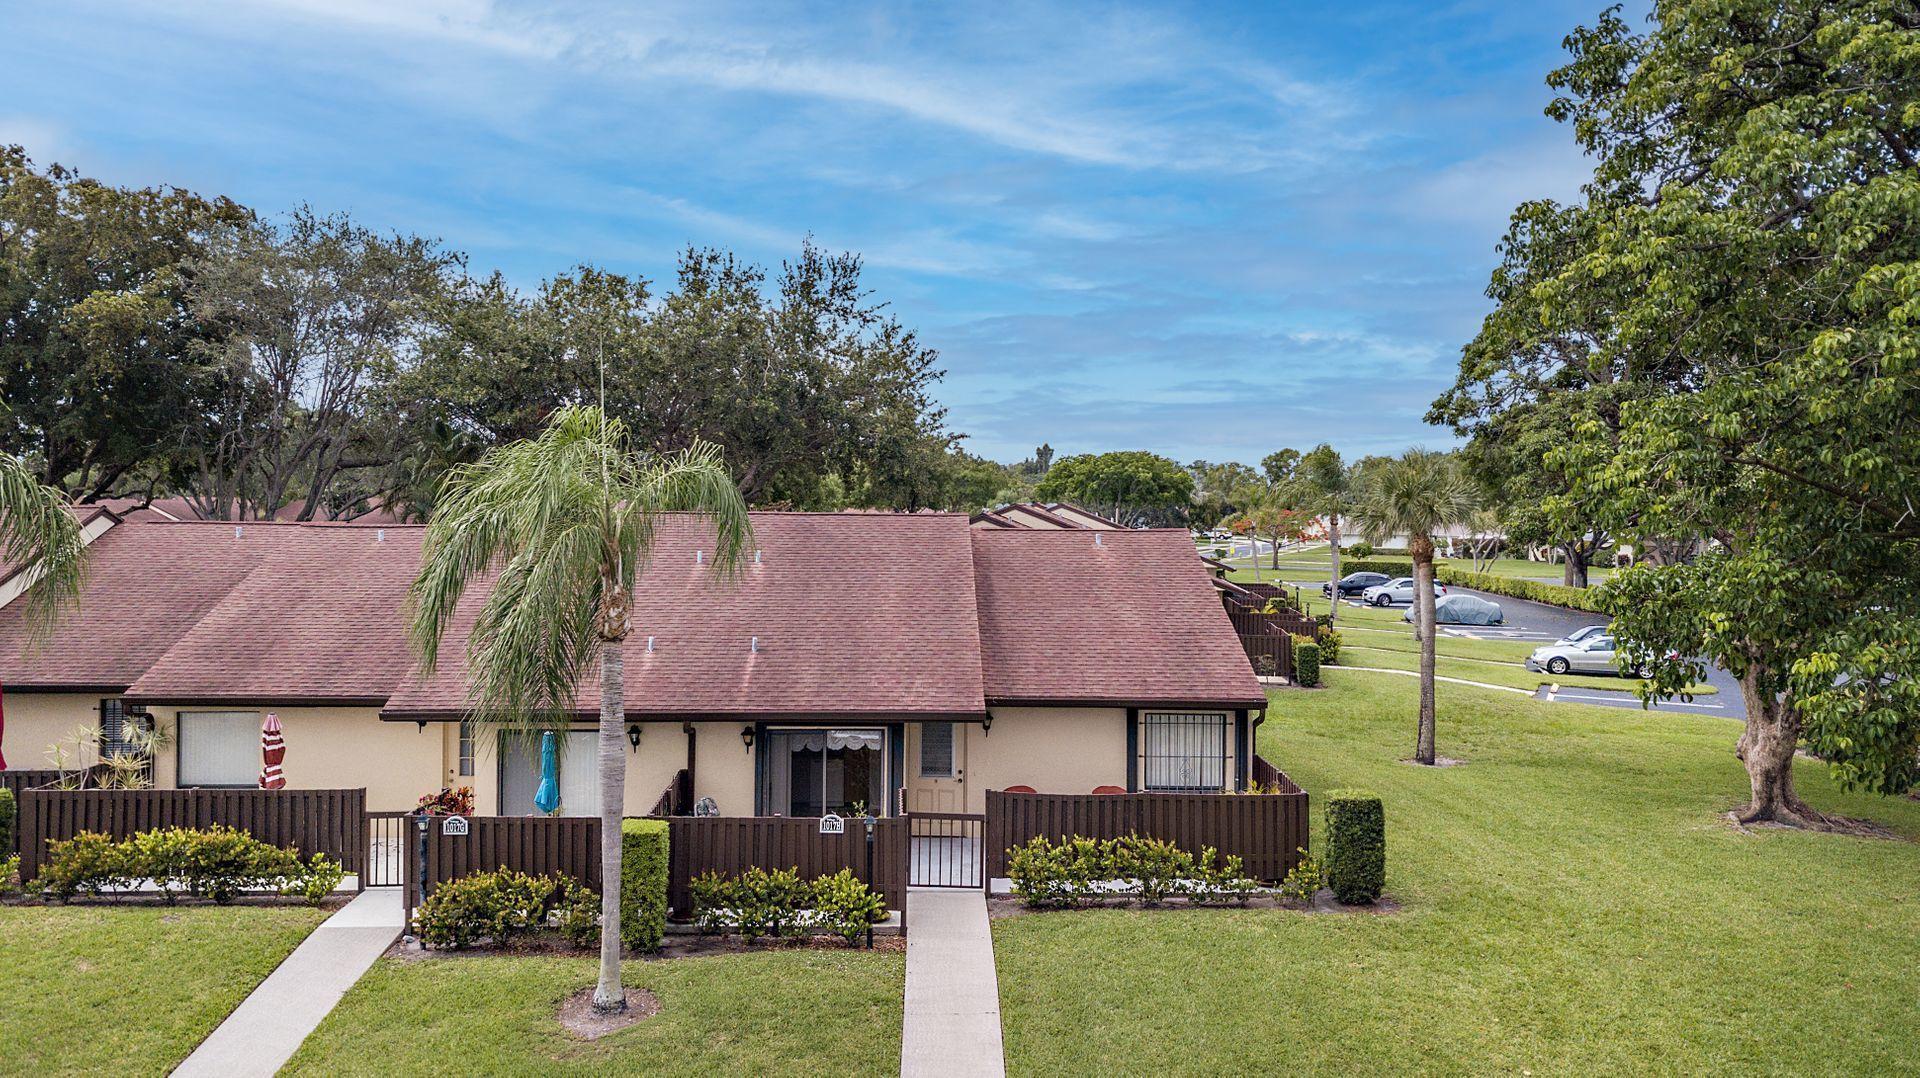 1017 Green Pine Boulevard #H - 33409 - FL - West Palm Beach